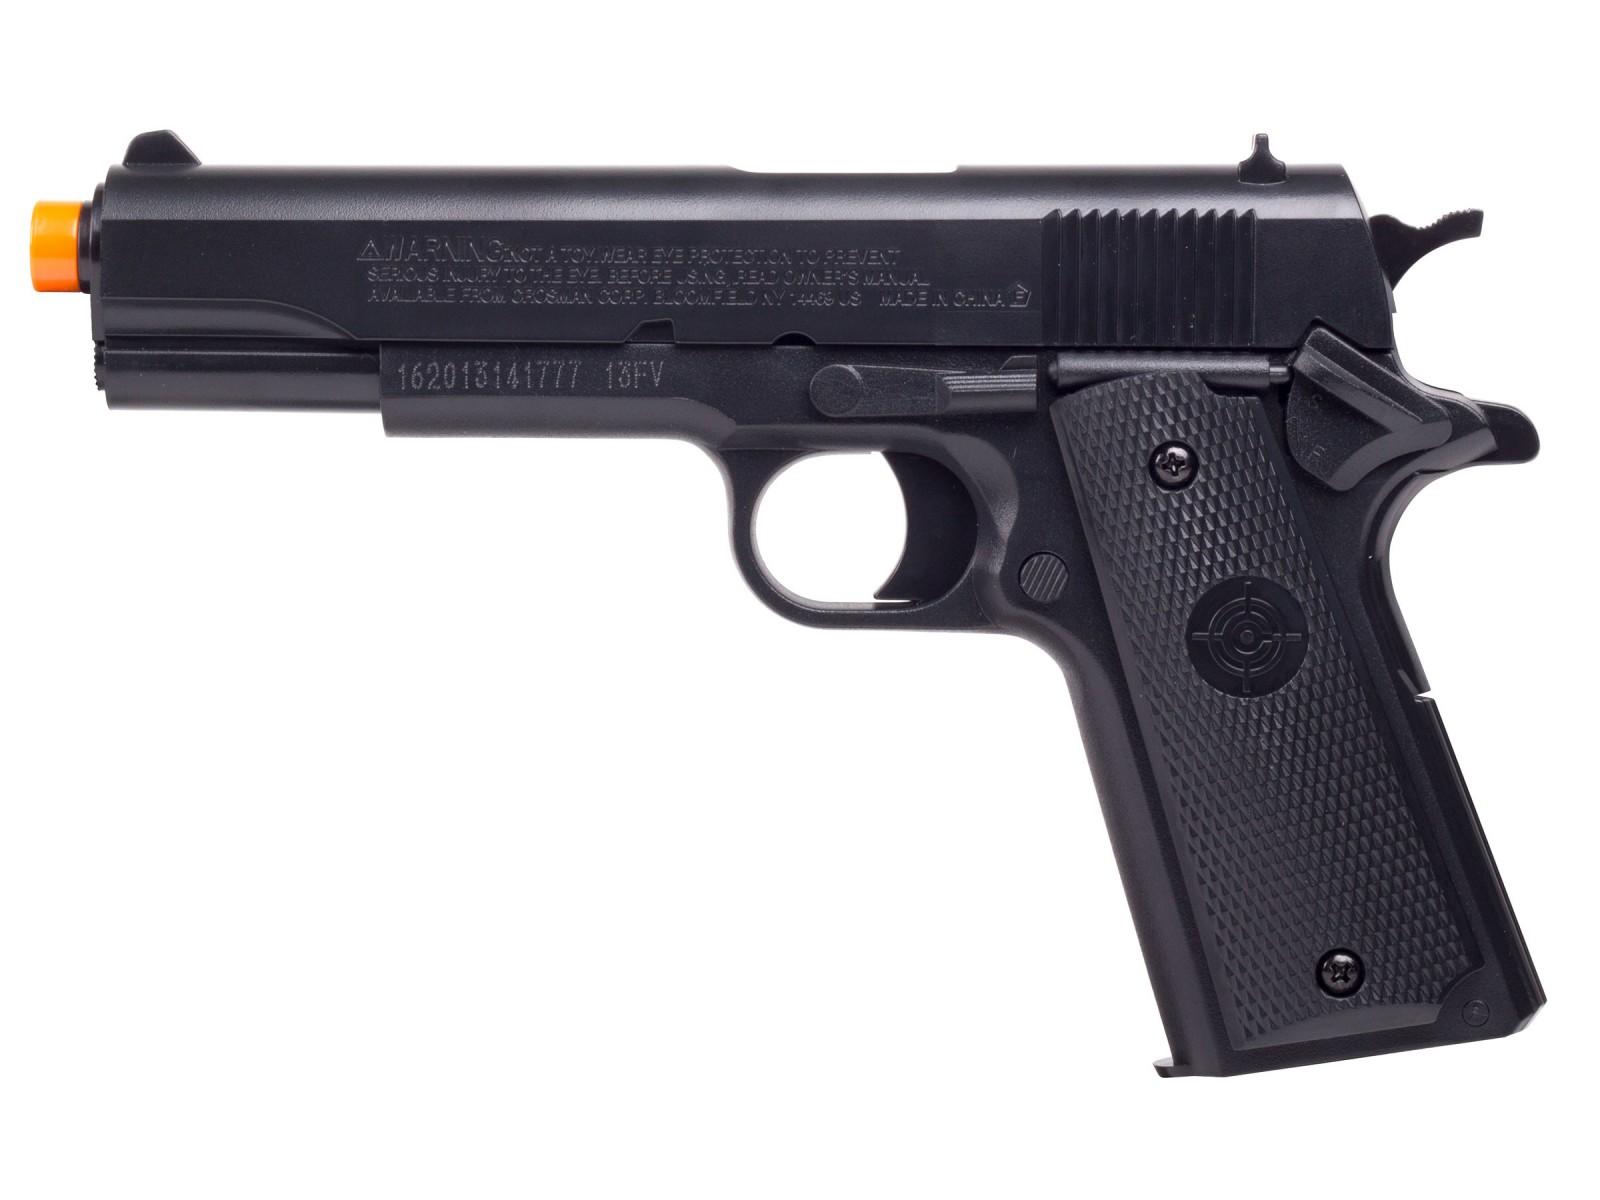 Crosman_ASP311_Spring_Airsoft_Pistol_Black_6mm